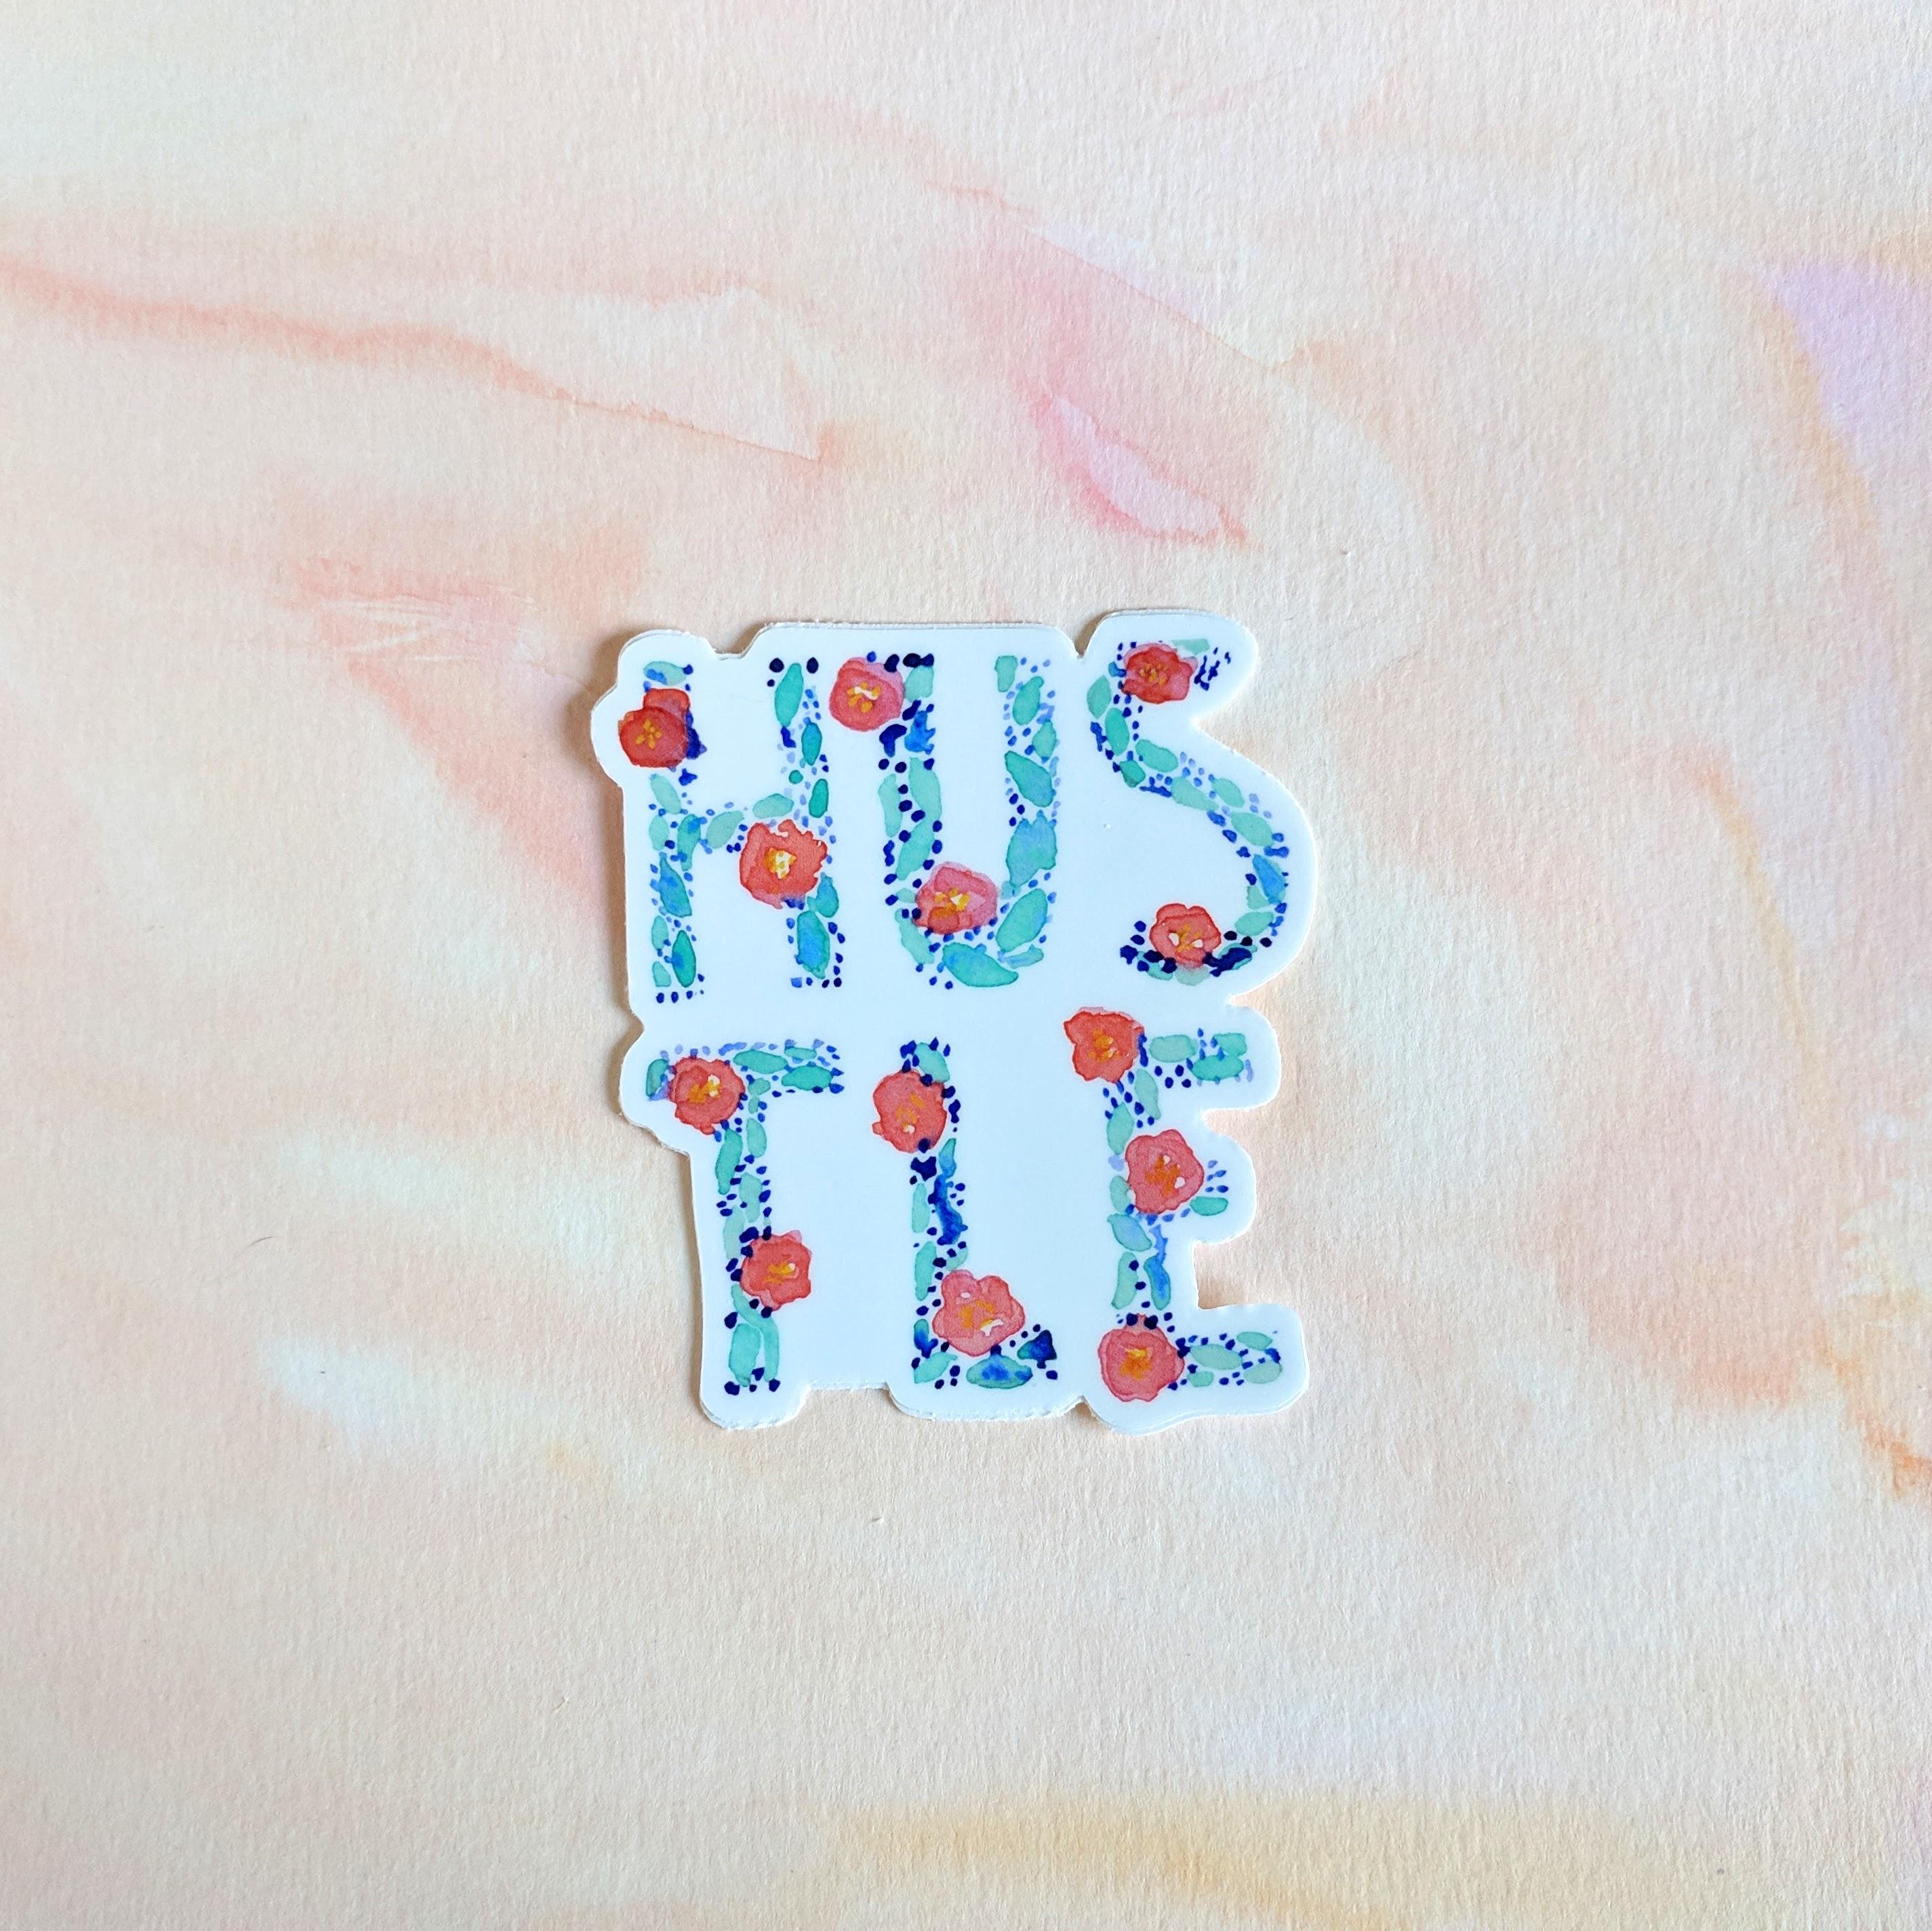 Hustle Lettering - Durable Vinyl Sticker - Watercolor Illustration 00014